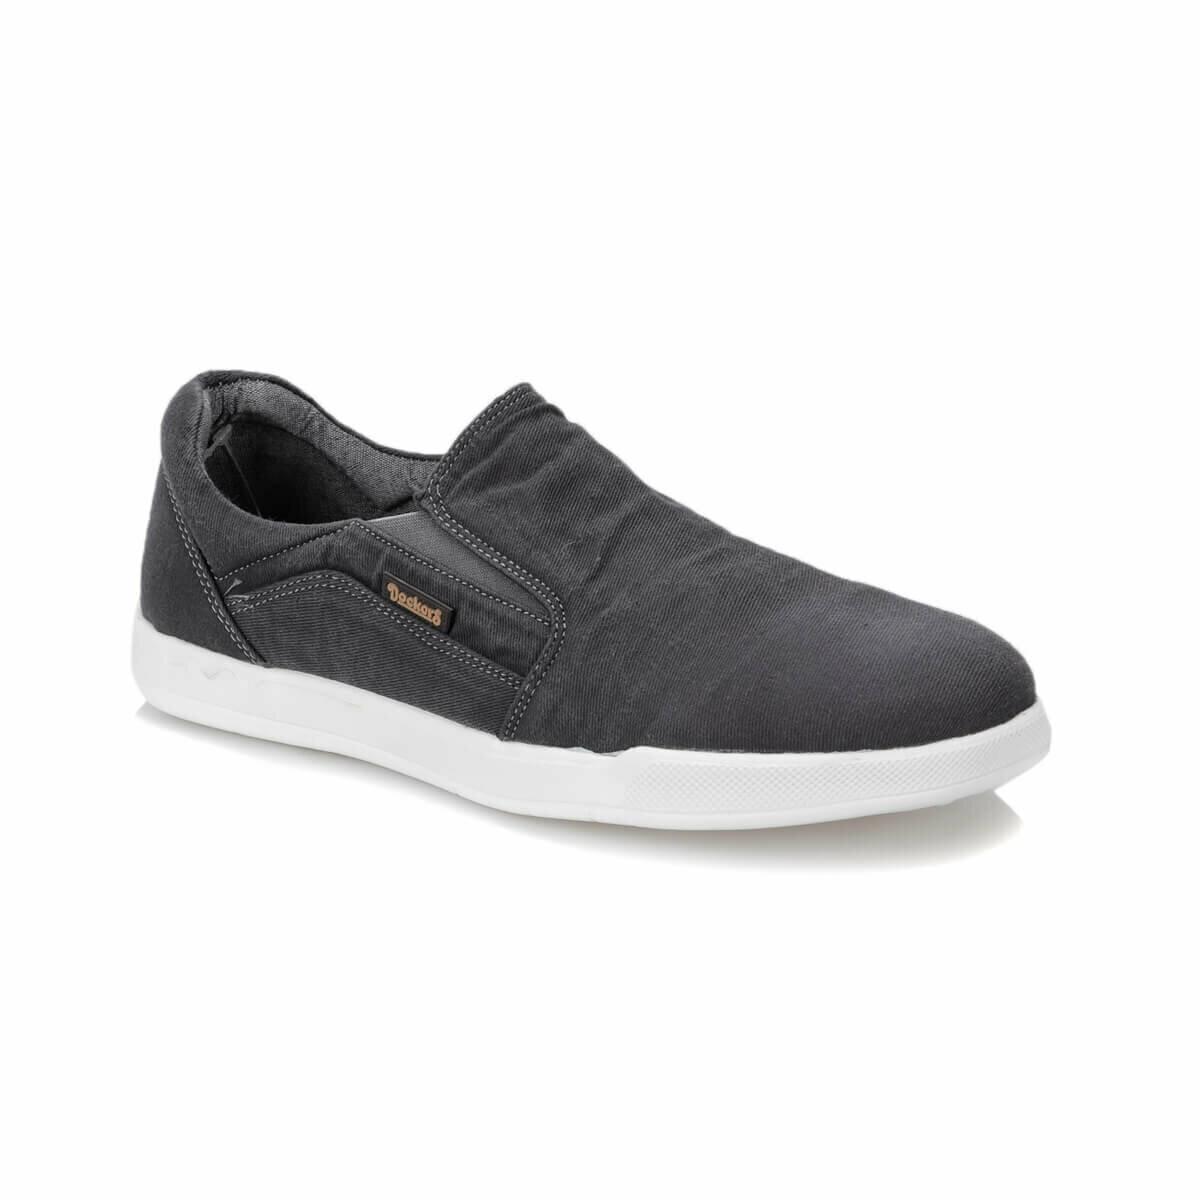 FLO 226371 Black Male Sneaker Shoes By Dockers The Gerle